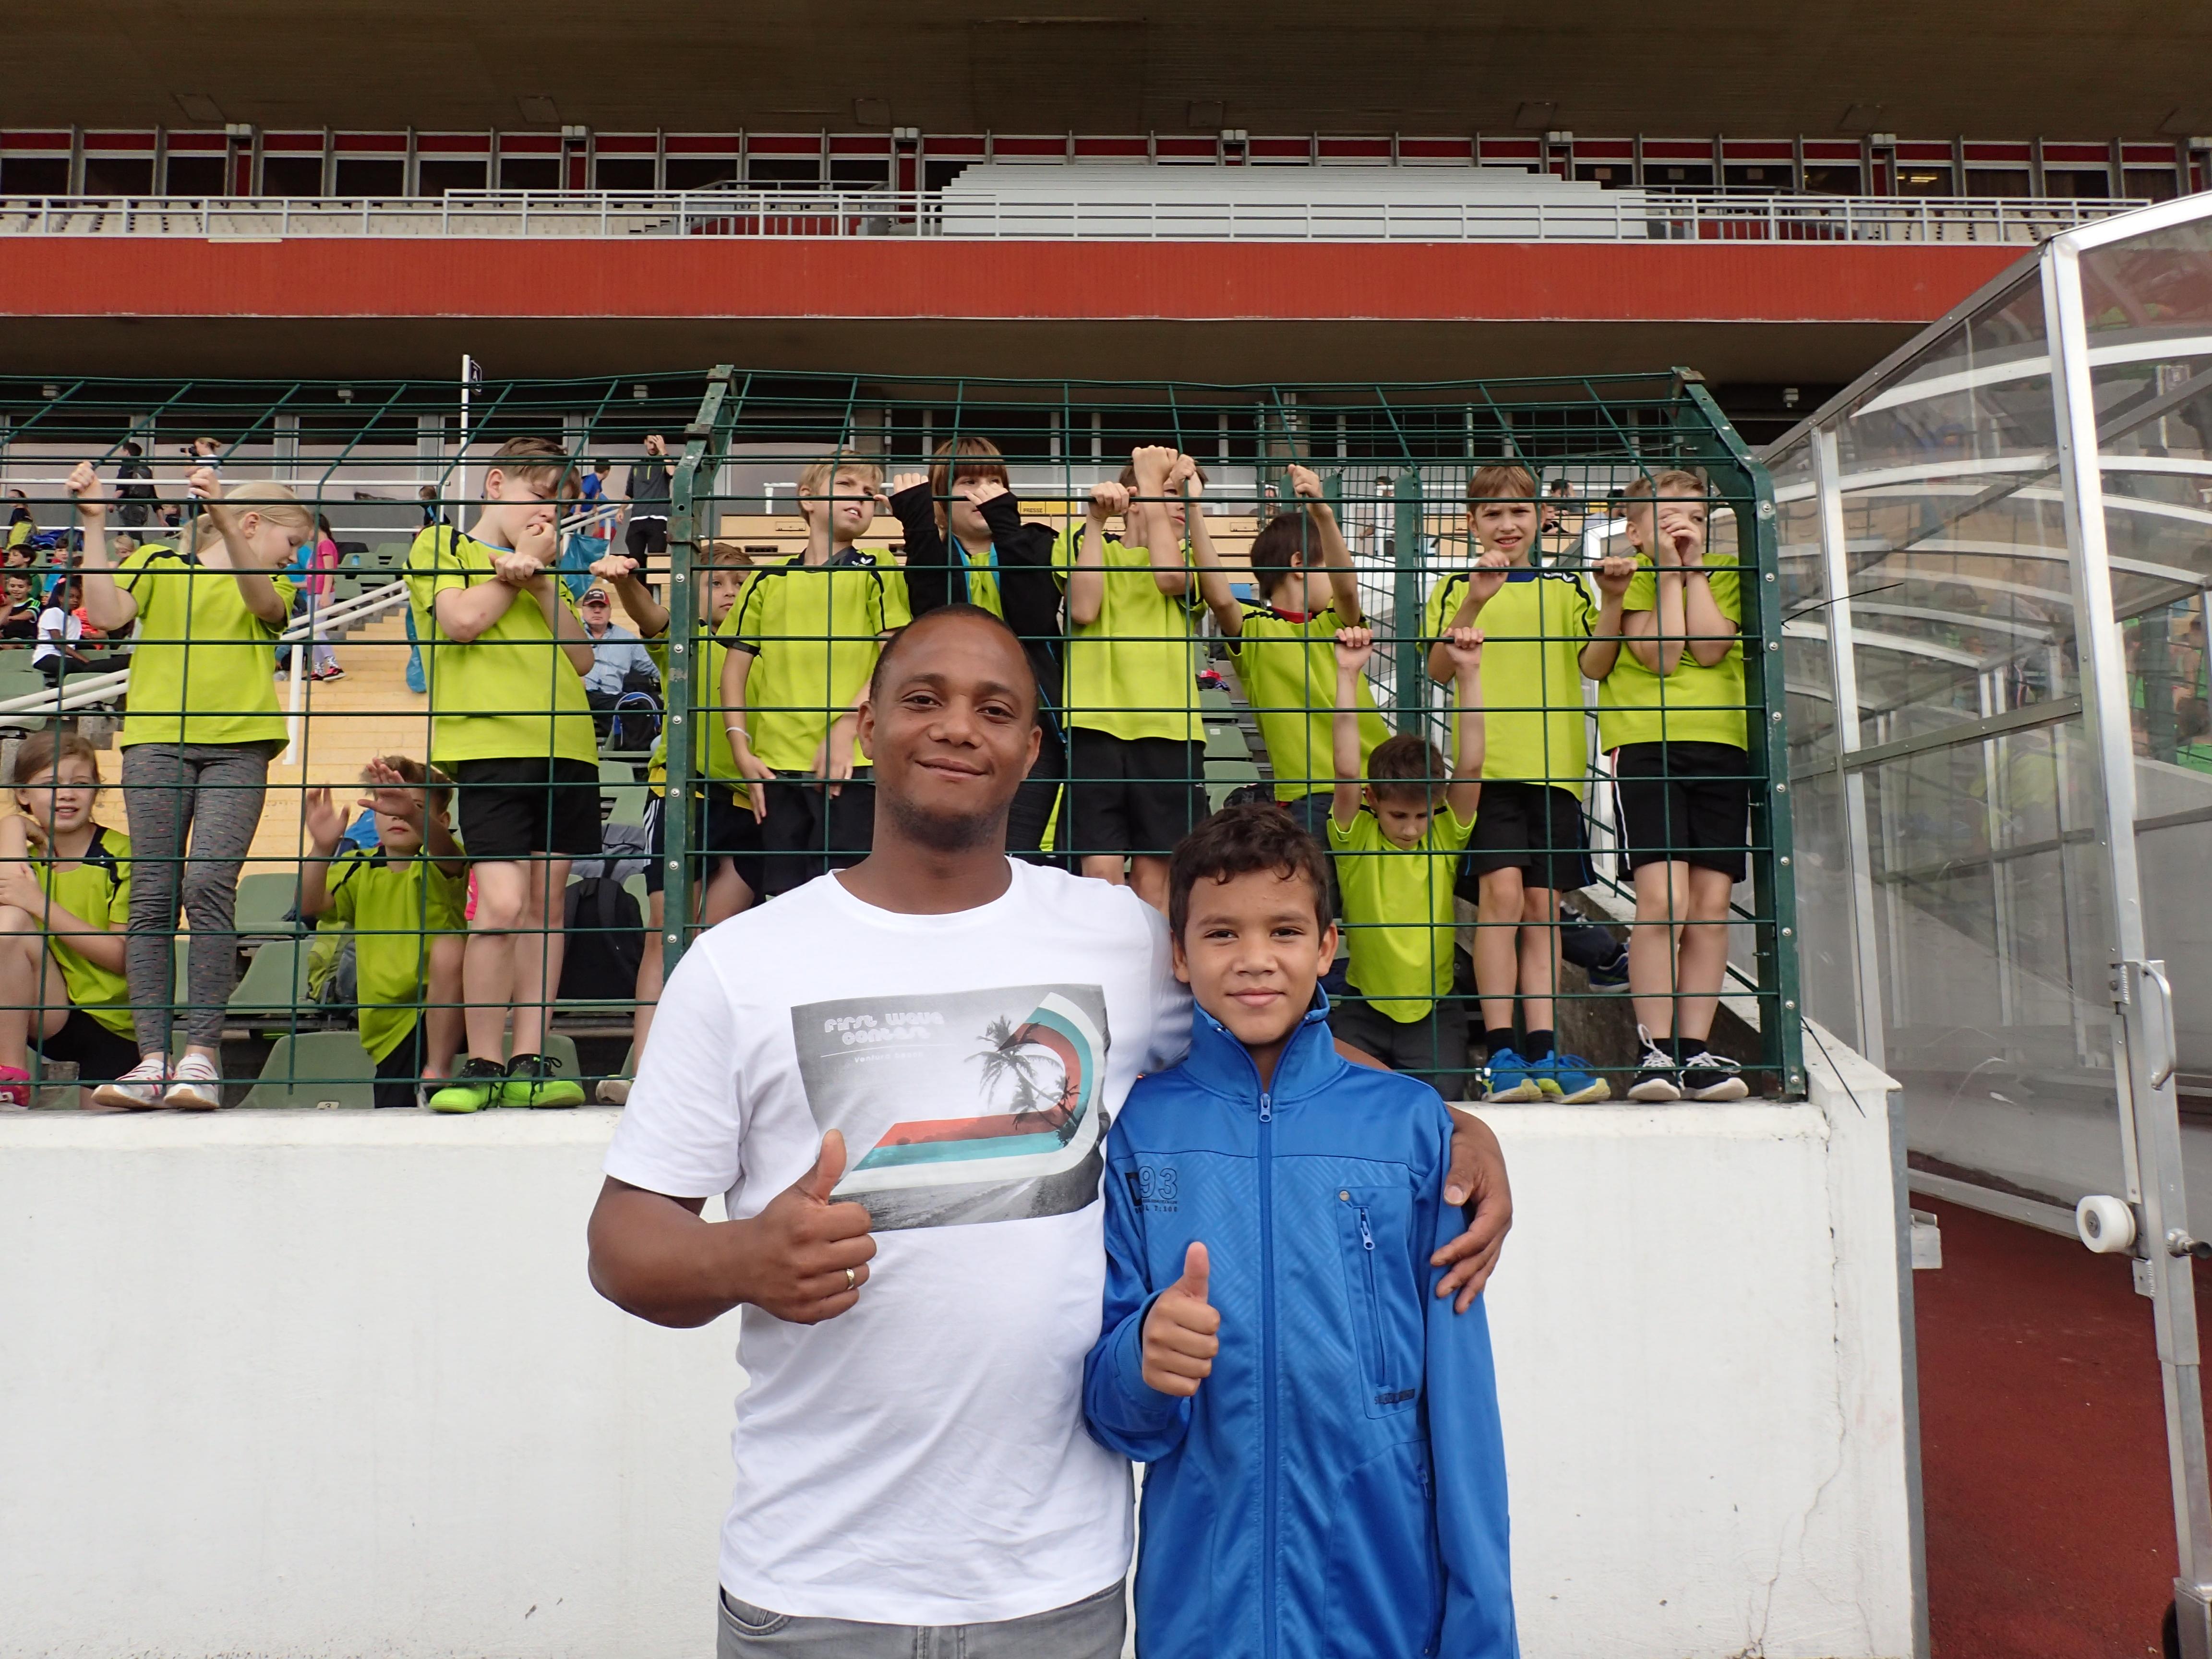 LSB, Berlin hat Talent, ISTAF, Schools Cup, Friedrich-Ludwig-Jahn-Sportpark